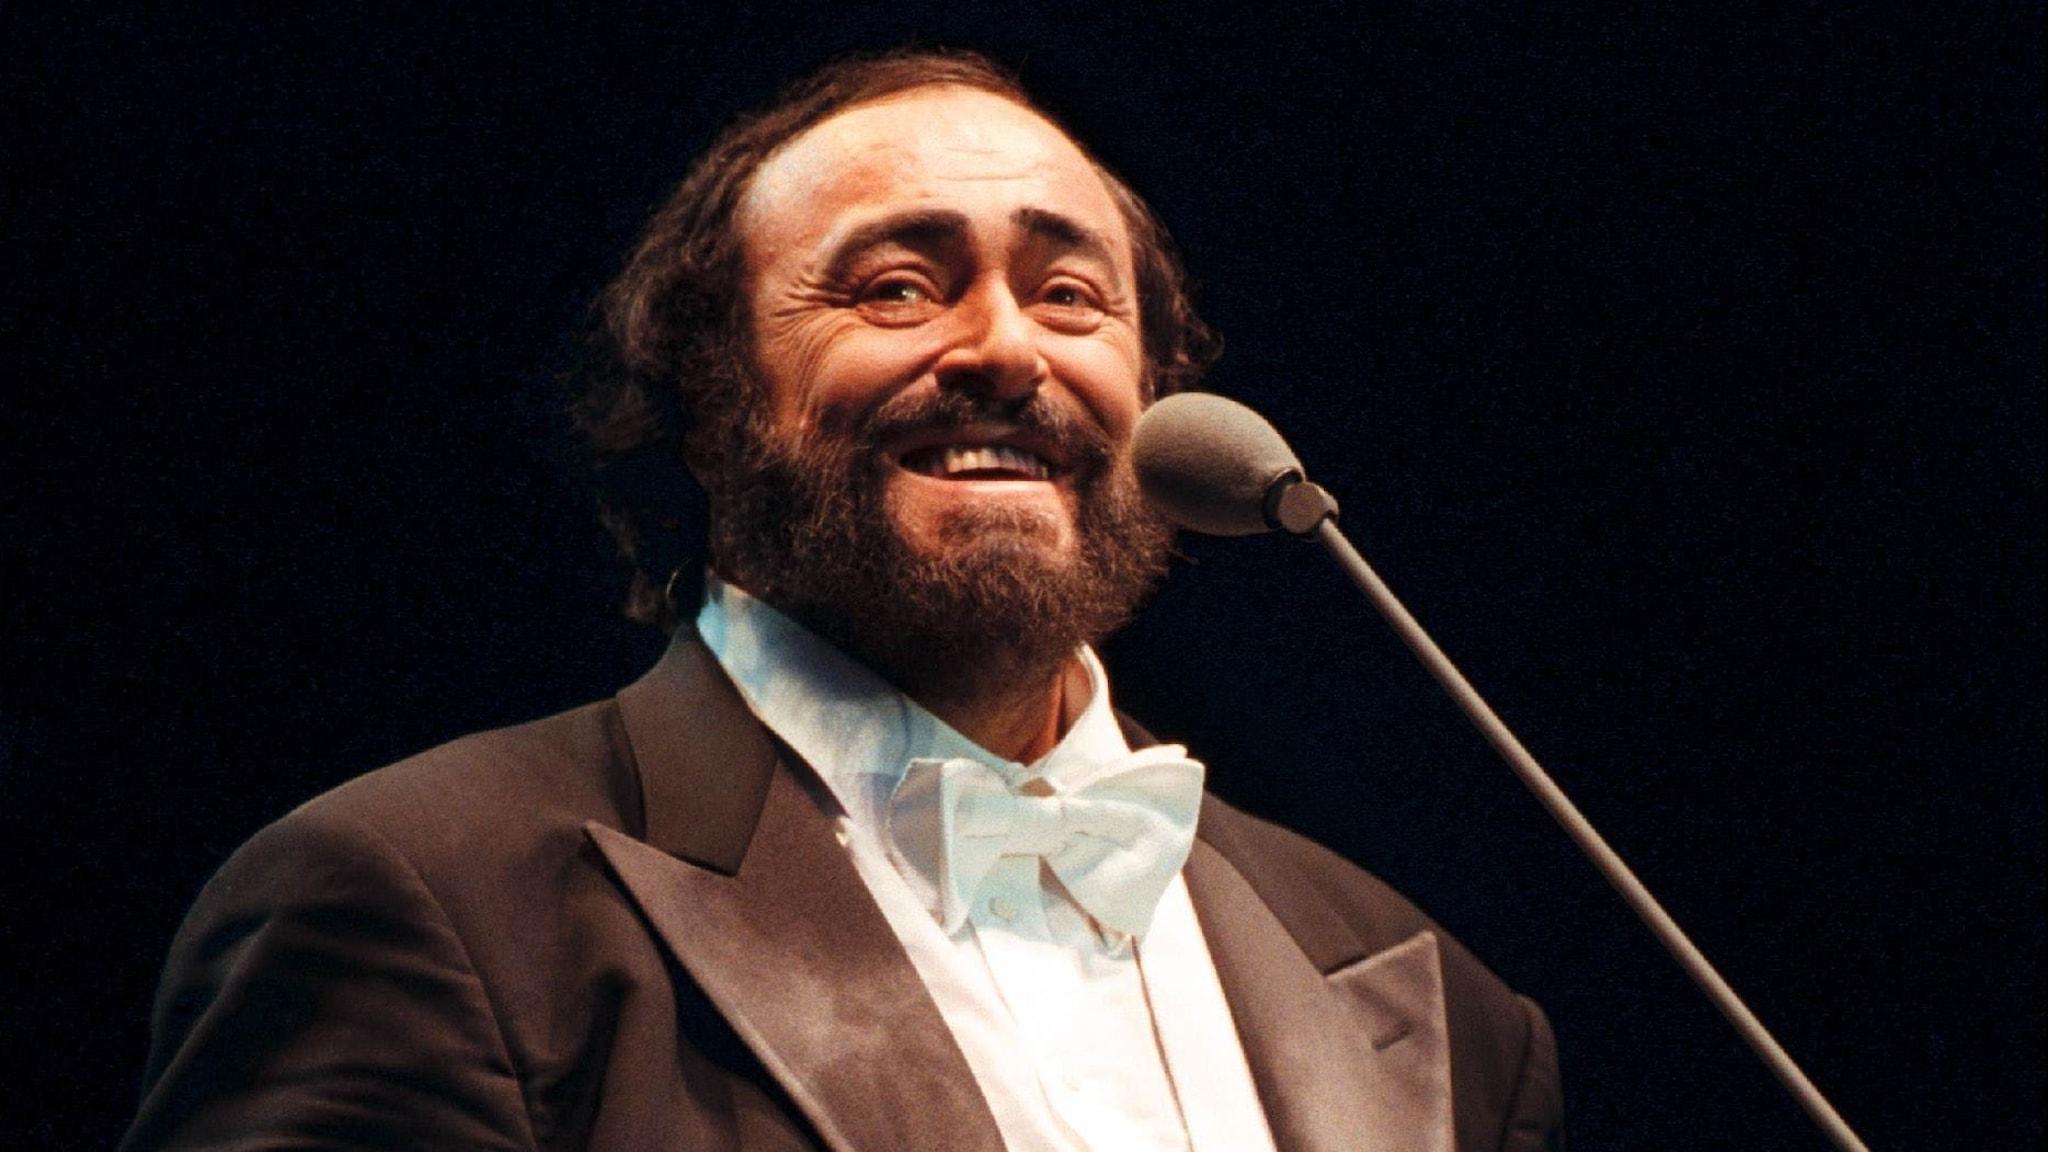 Bild: Luciano Pavarotti, tenor.